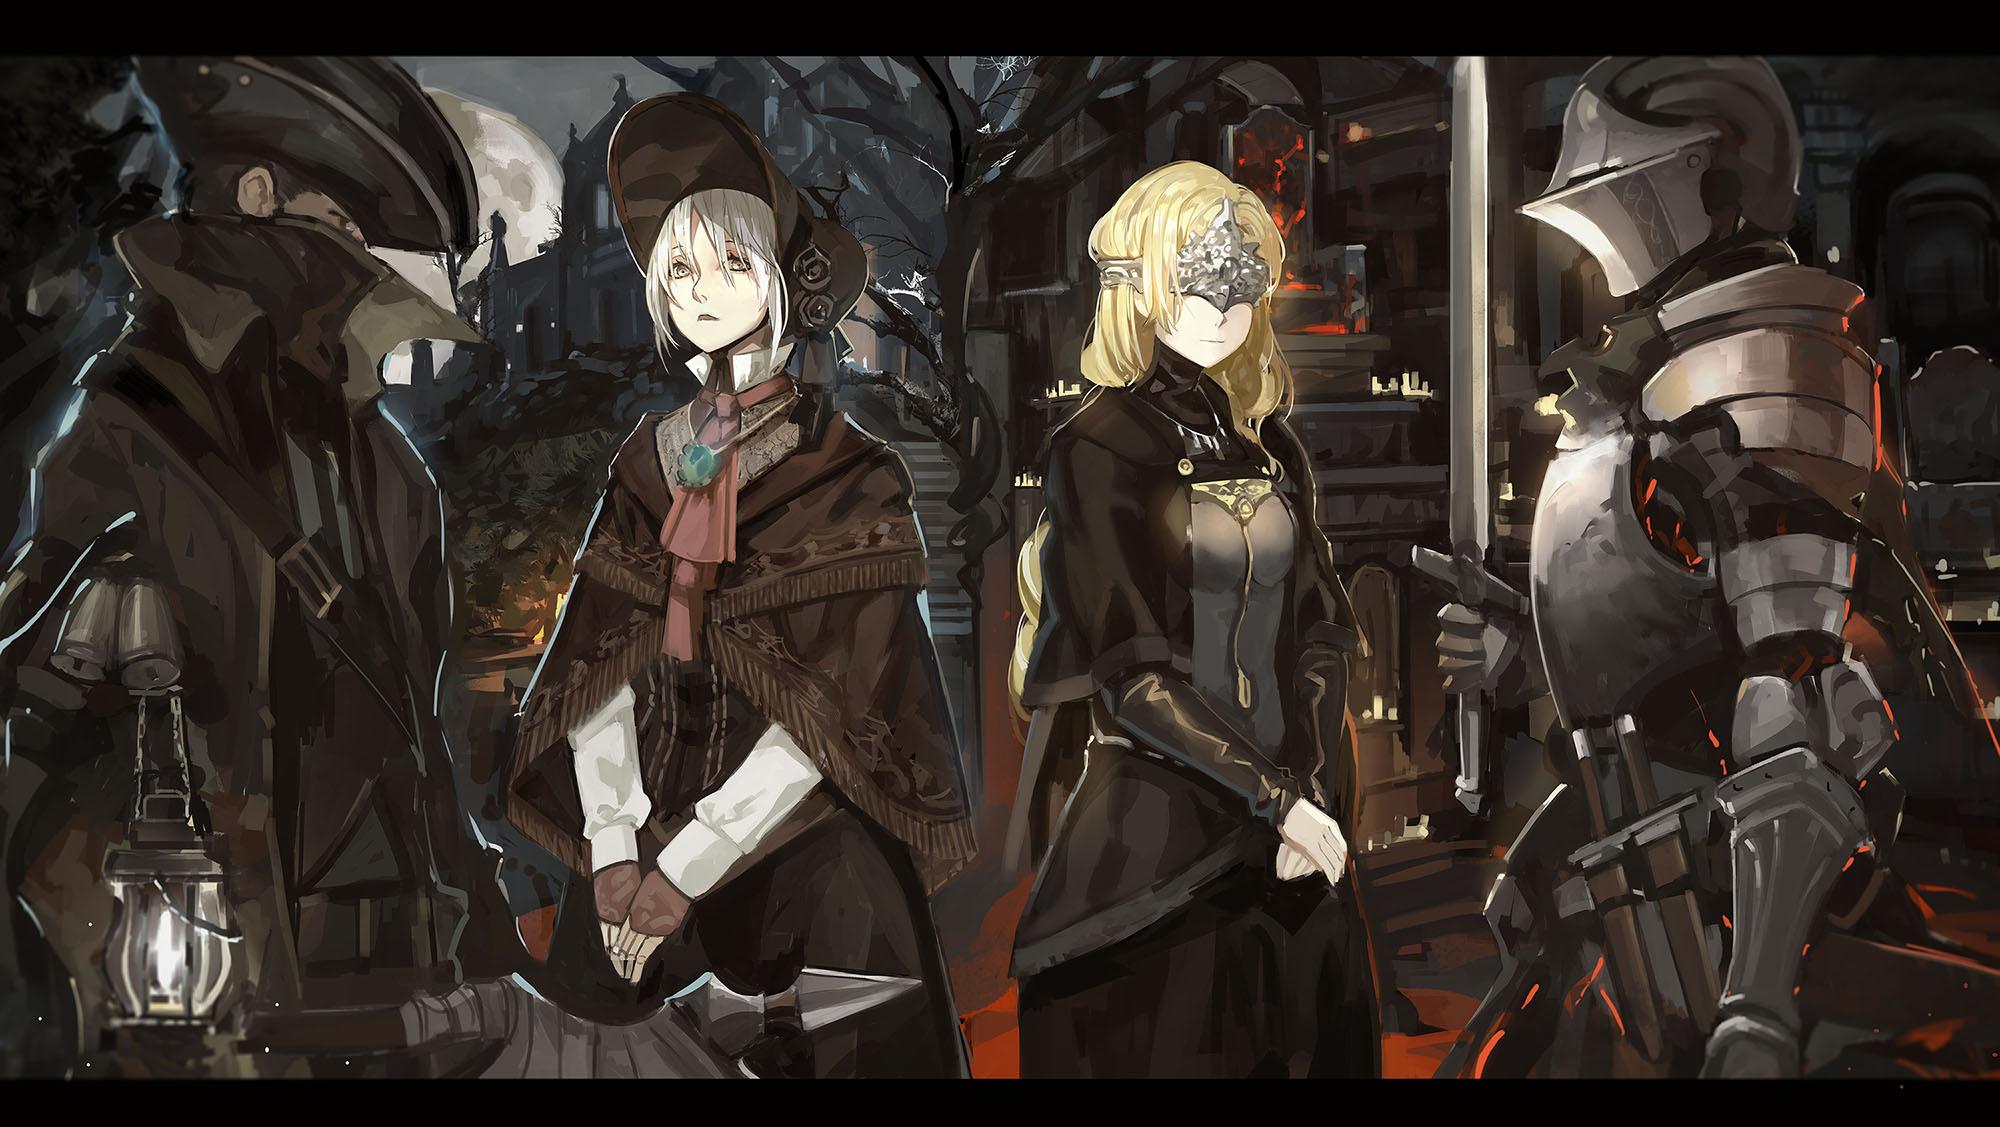 Dark Souls 3 Fire Keeper Cosplay: ID:700449 - Wallpaper Abyss